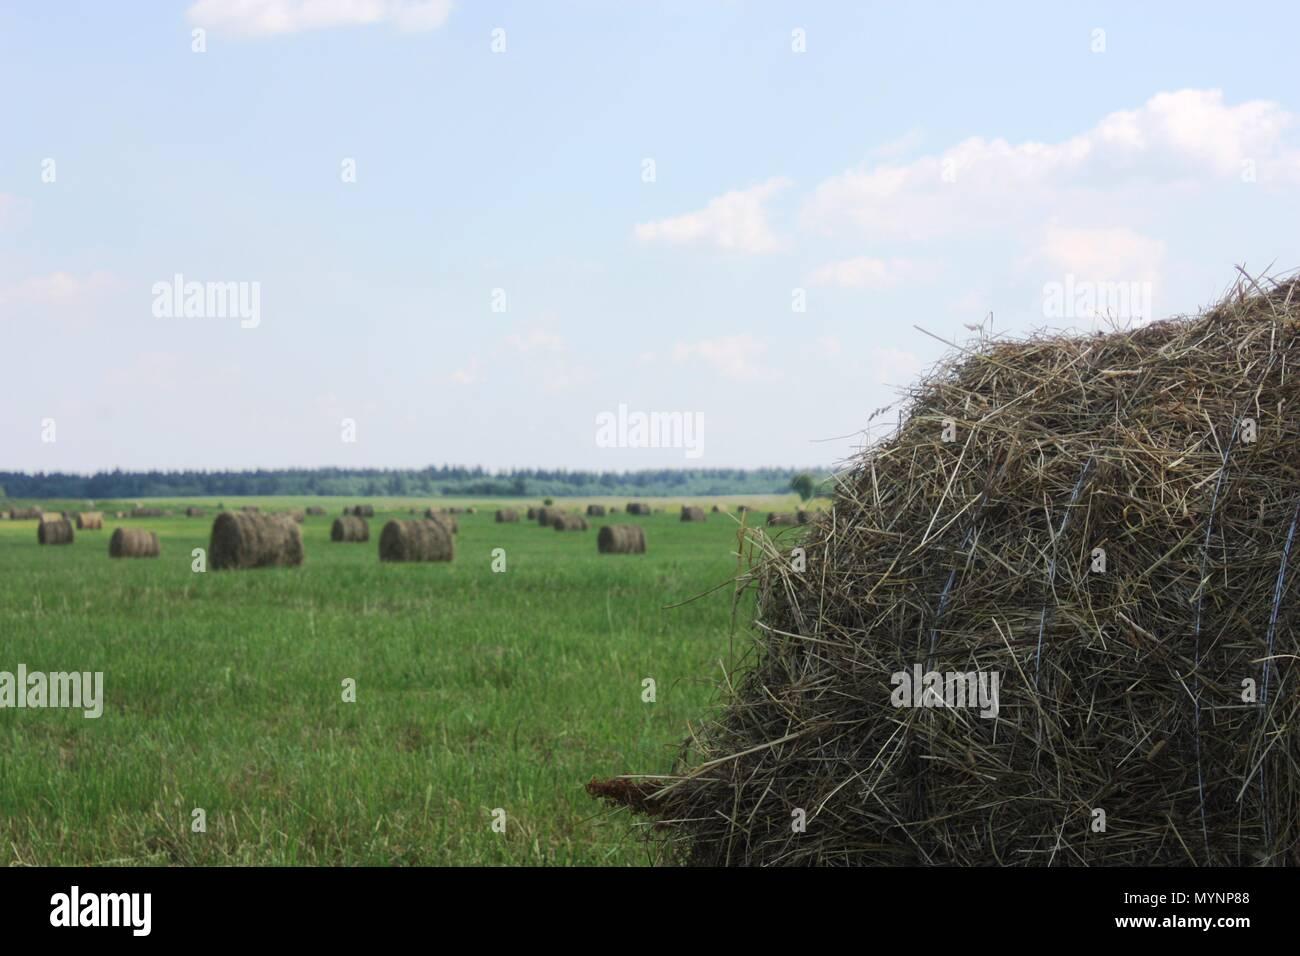 Hayfield. Round straw haystacks on a green field - Stock Image